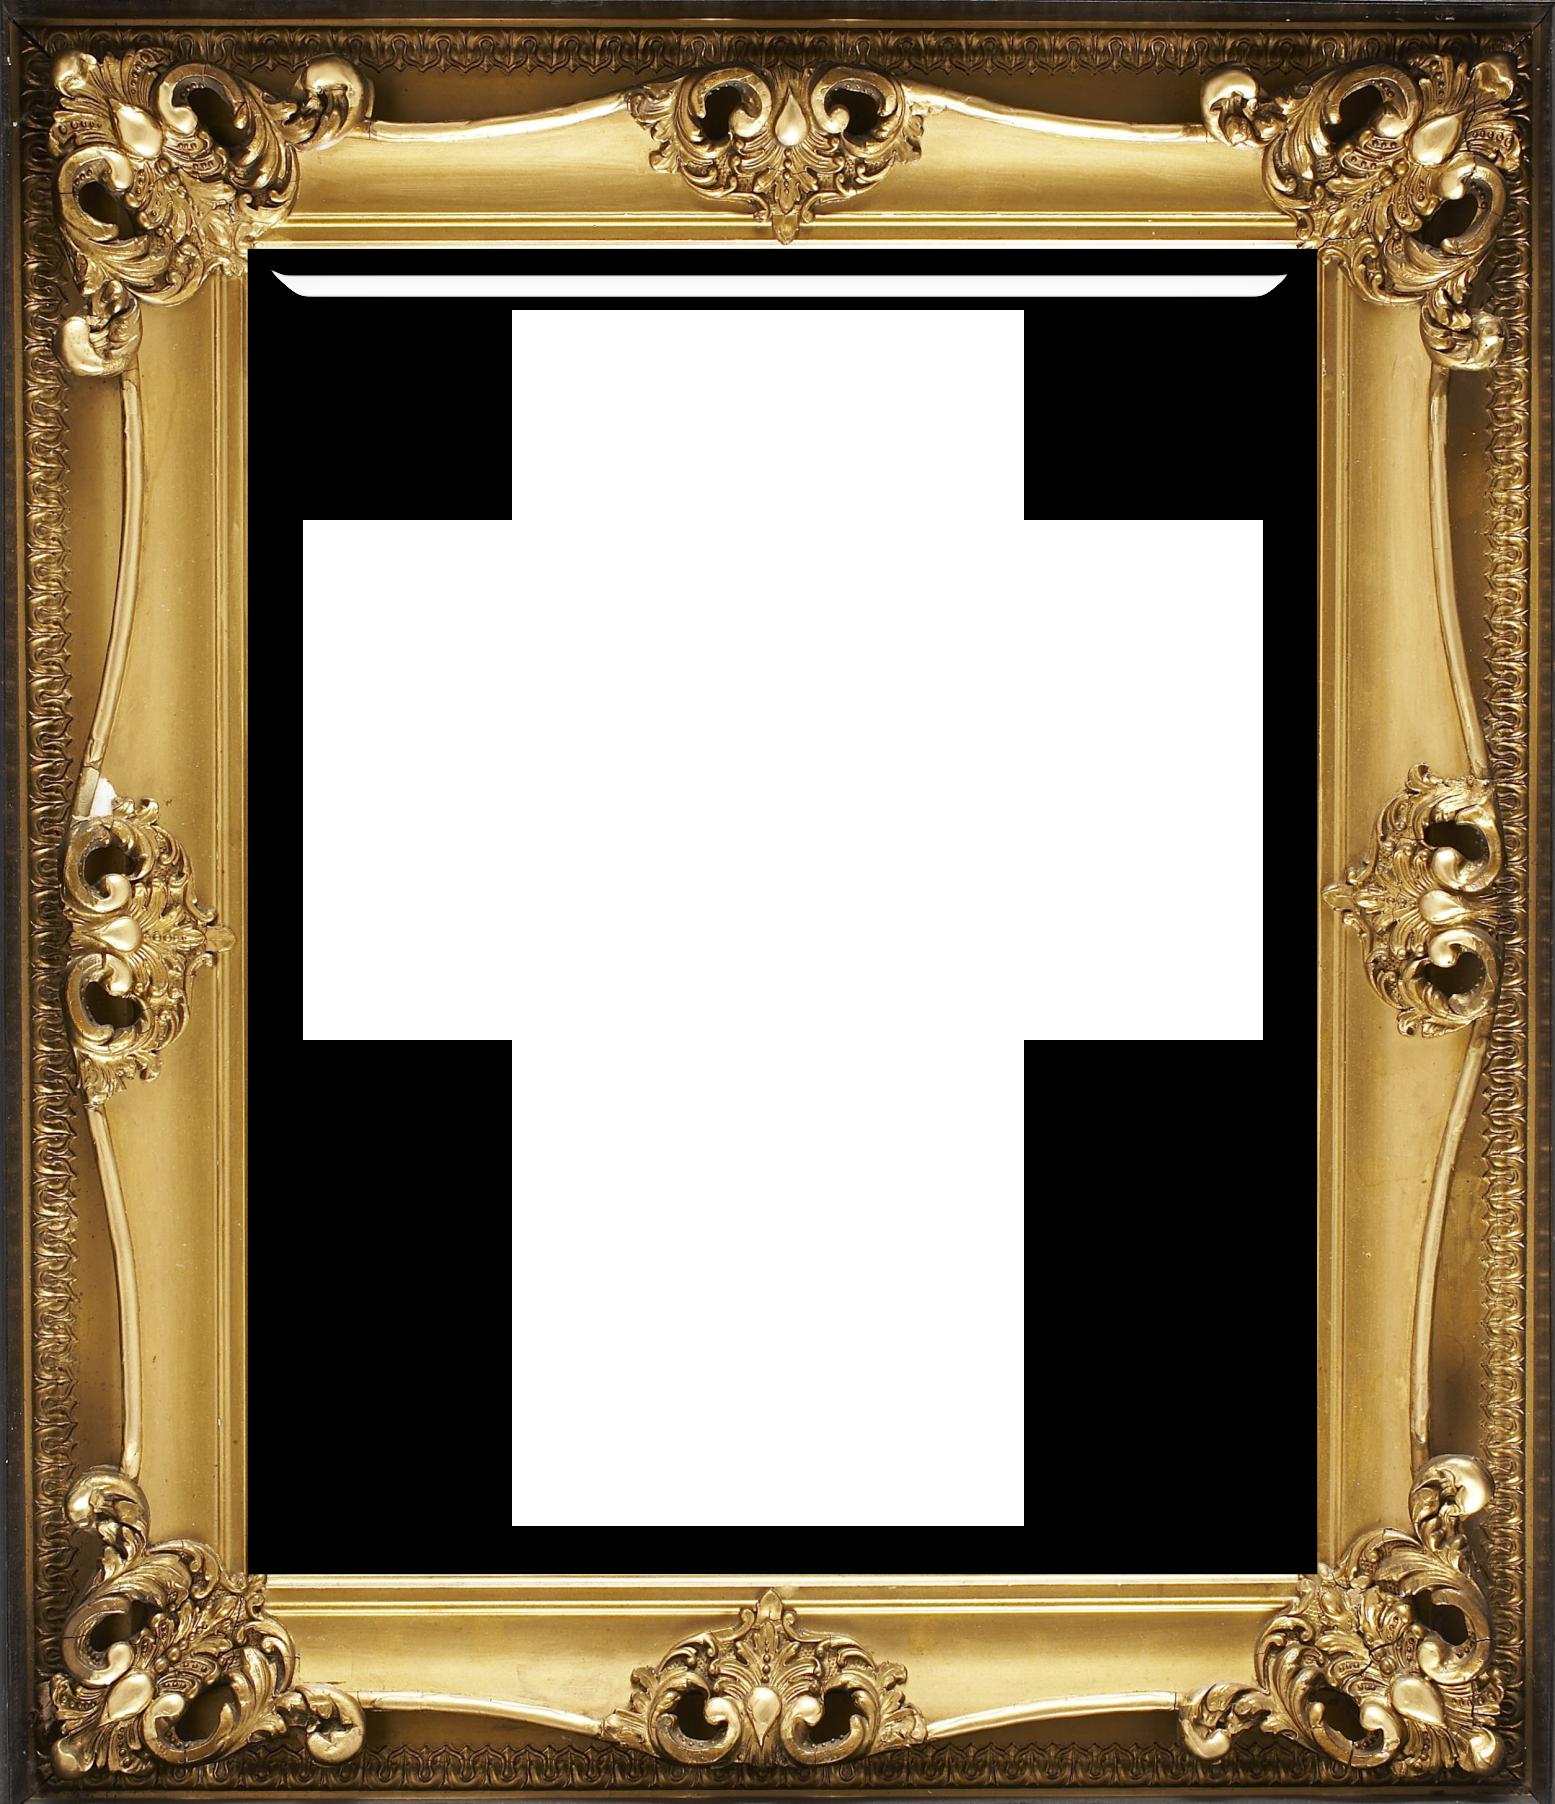 Mirror clipart fancy mirror. Vertical classic transparent frame